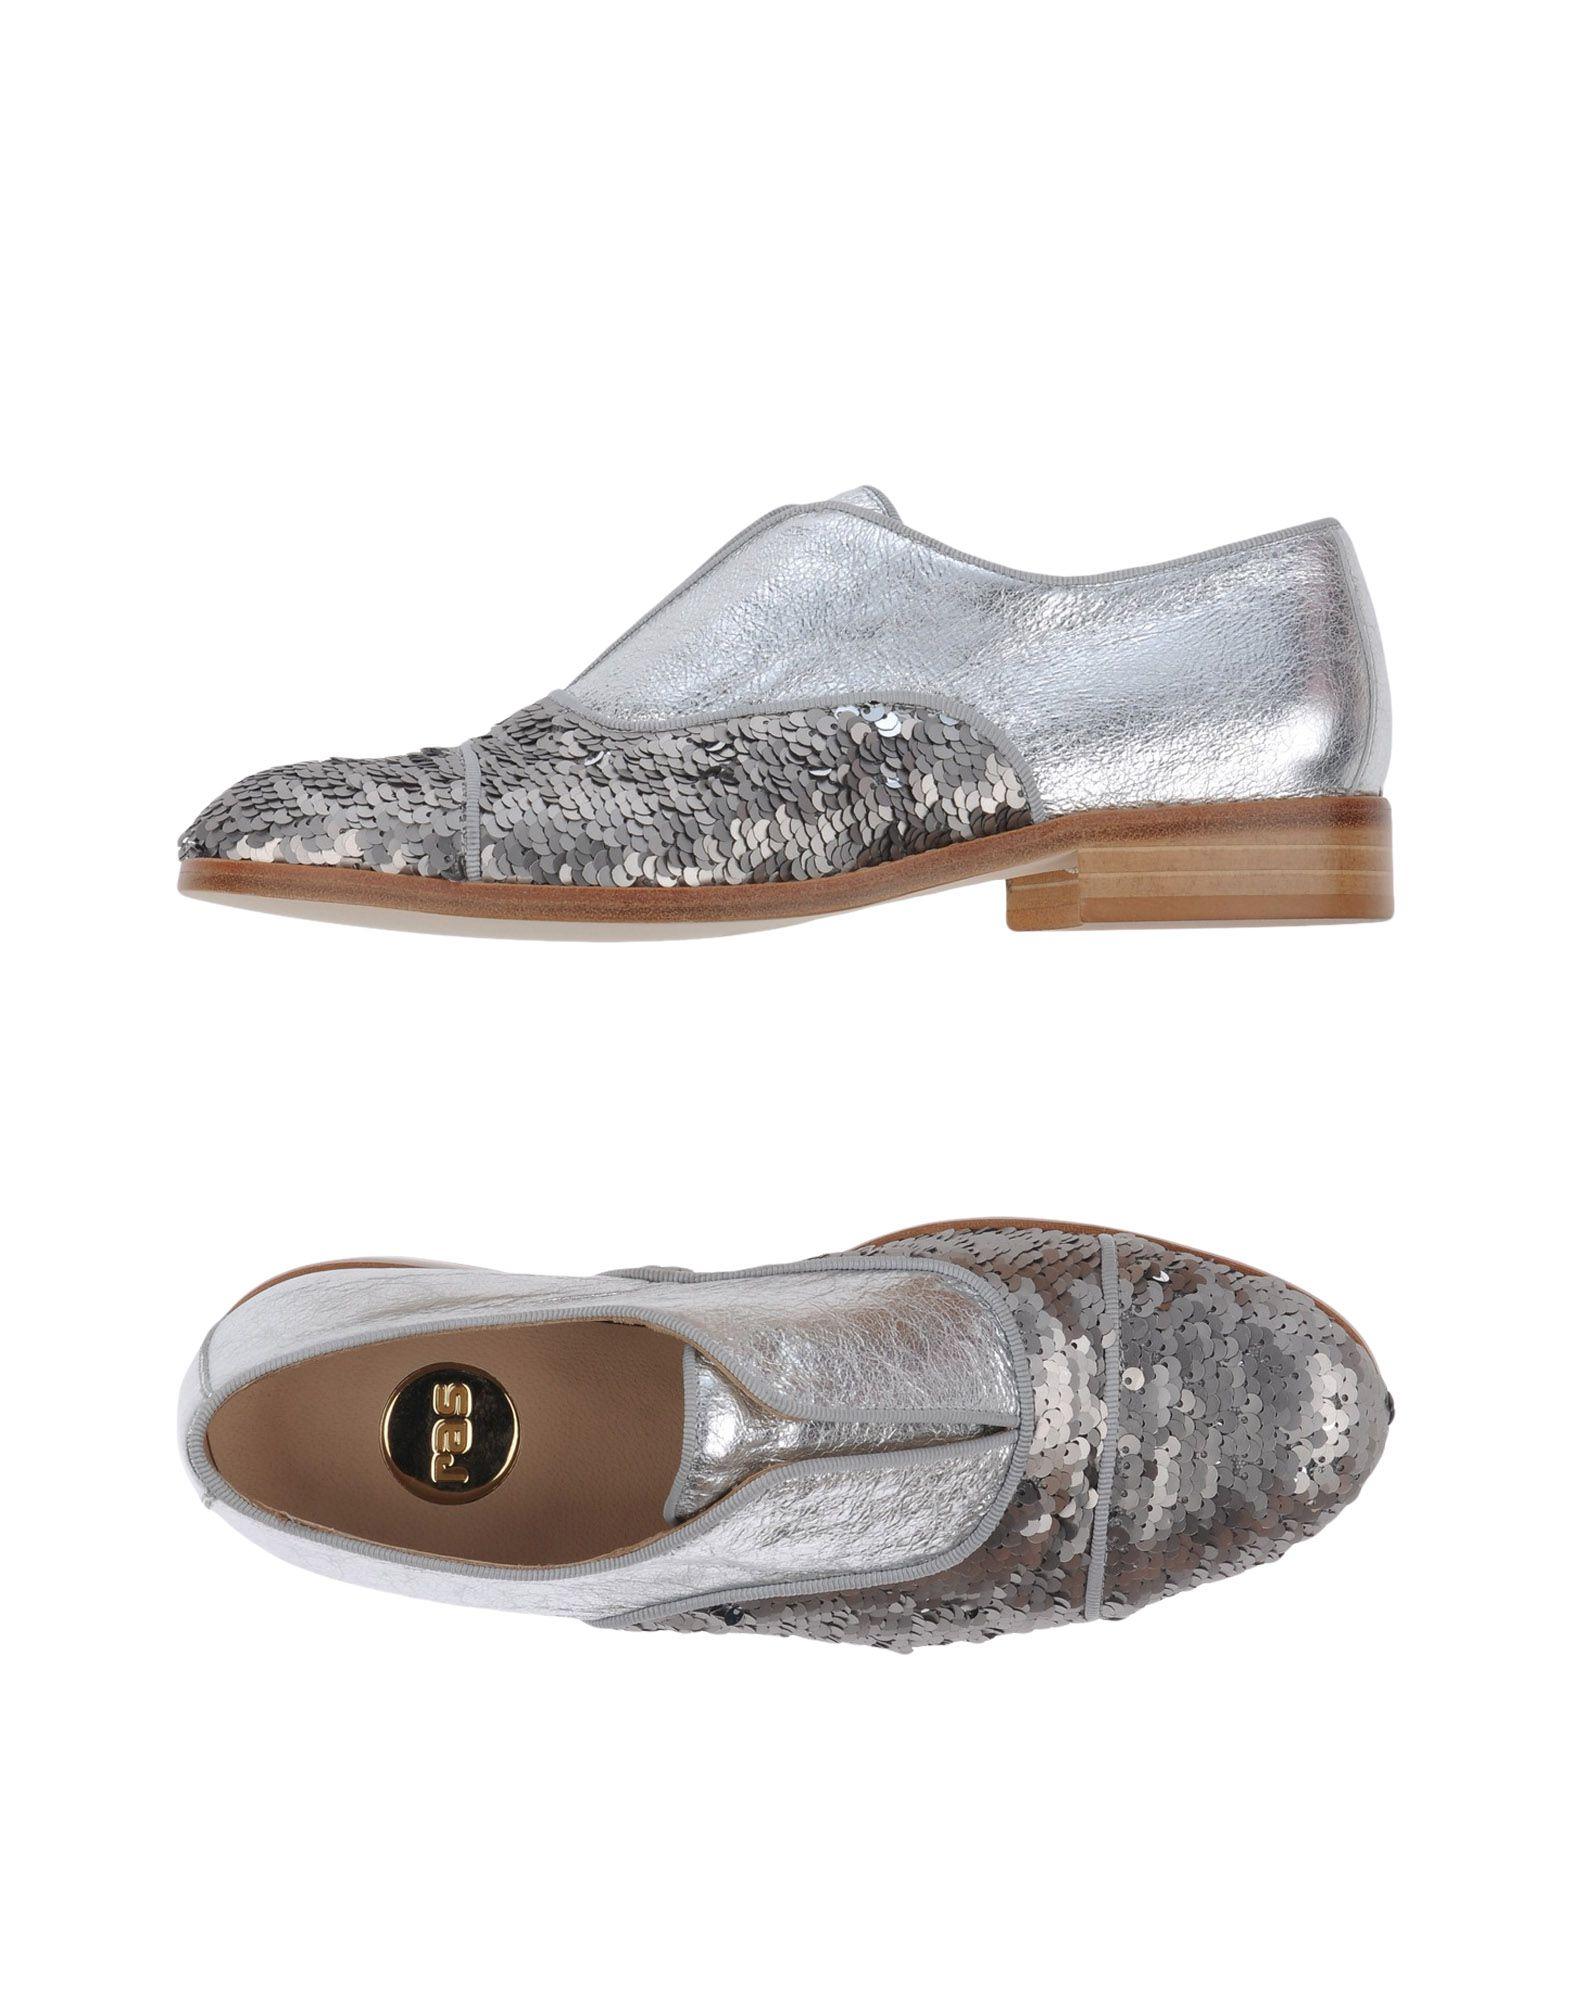 Ras Mokassins Damen  11236392IN Gute Qualität beliebte Schuhe